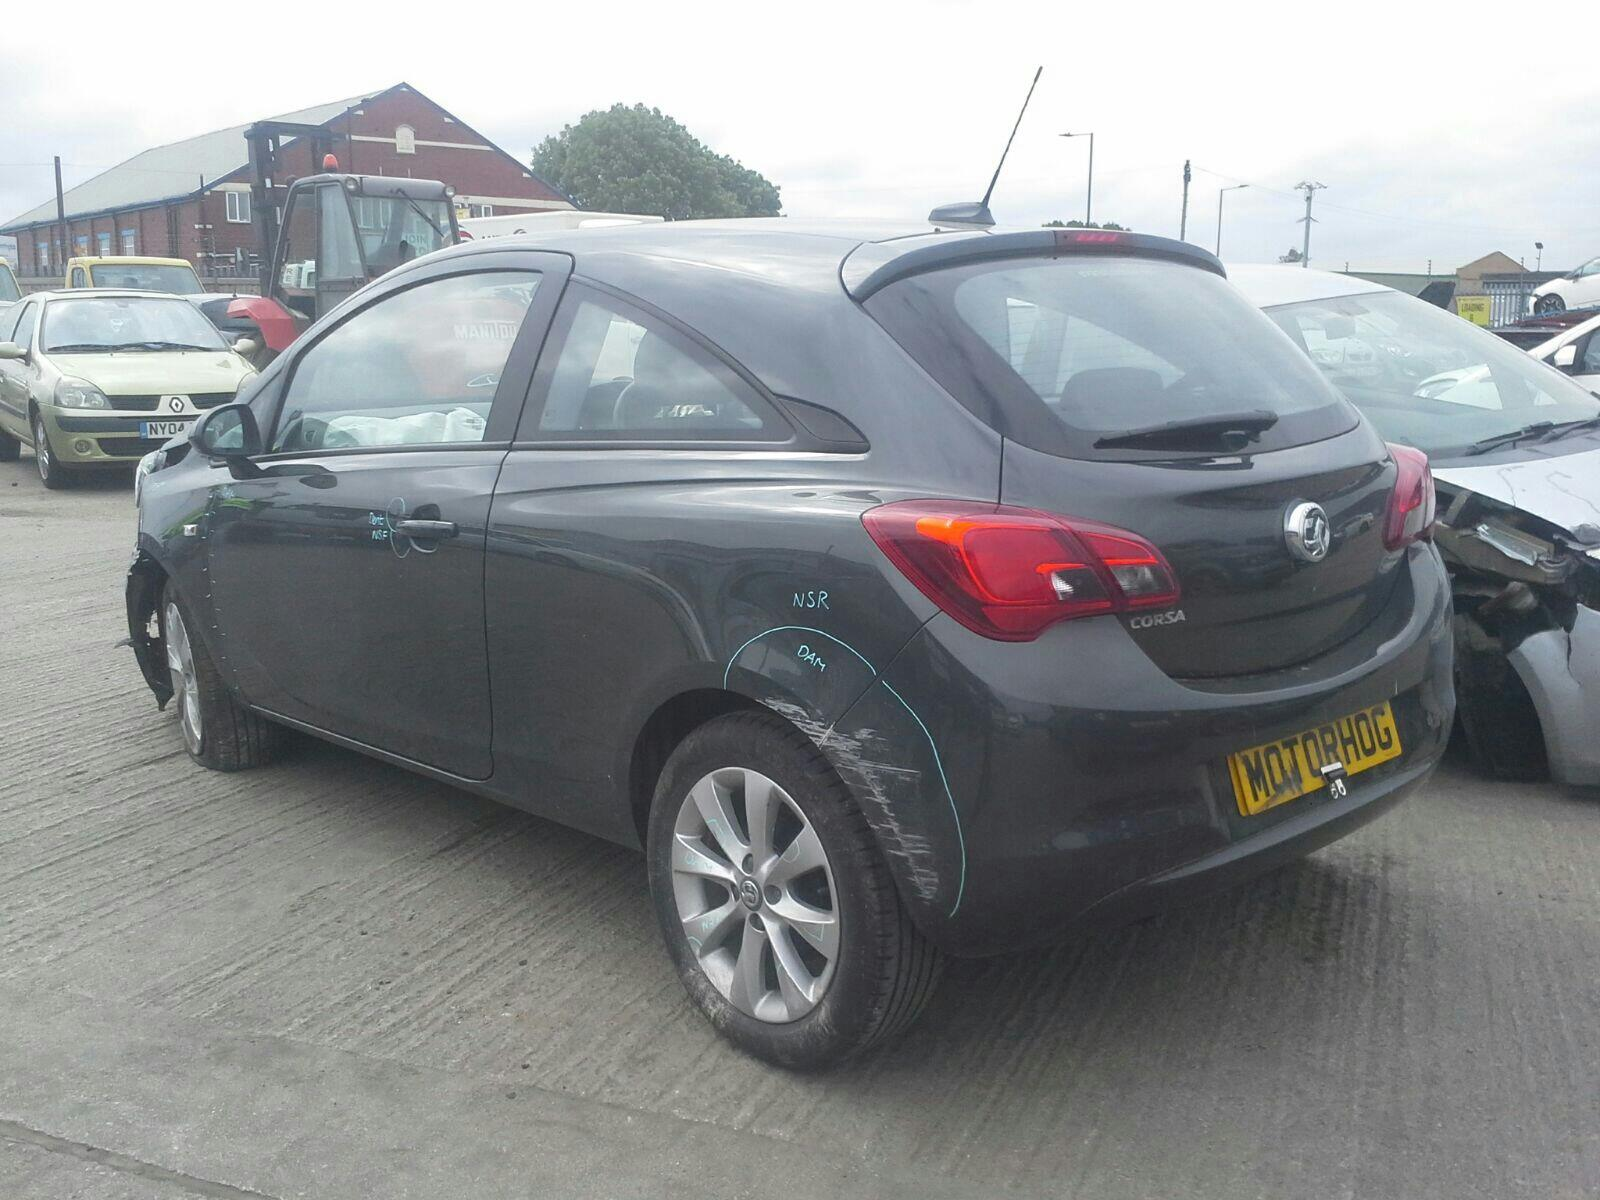 2017 Vauxhall Corsa 2014 On 3 Door Hatchback (Petrol